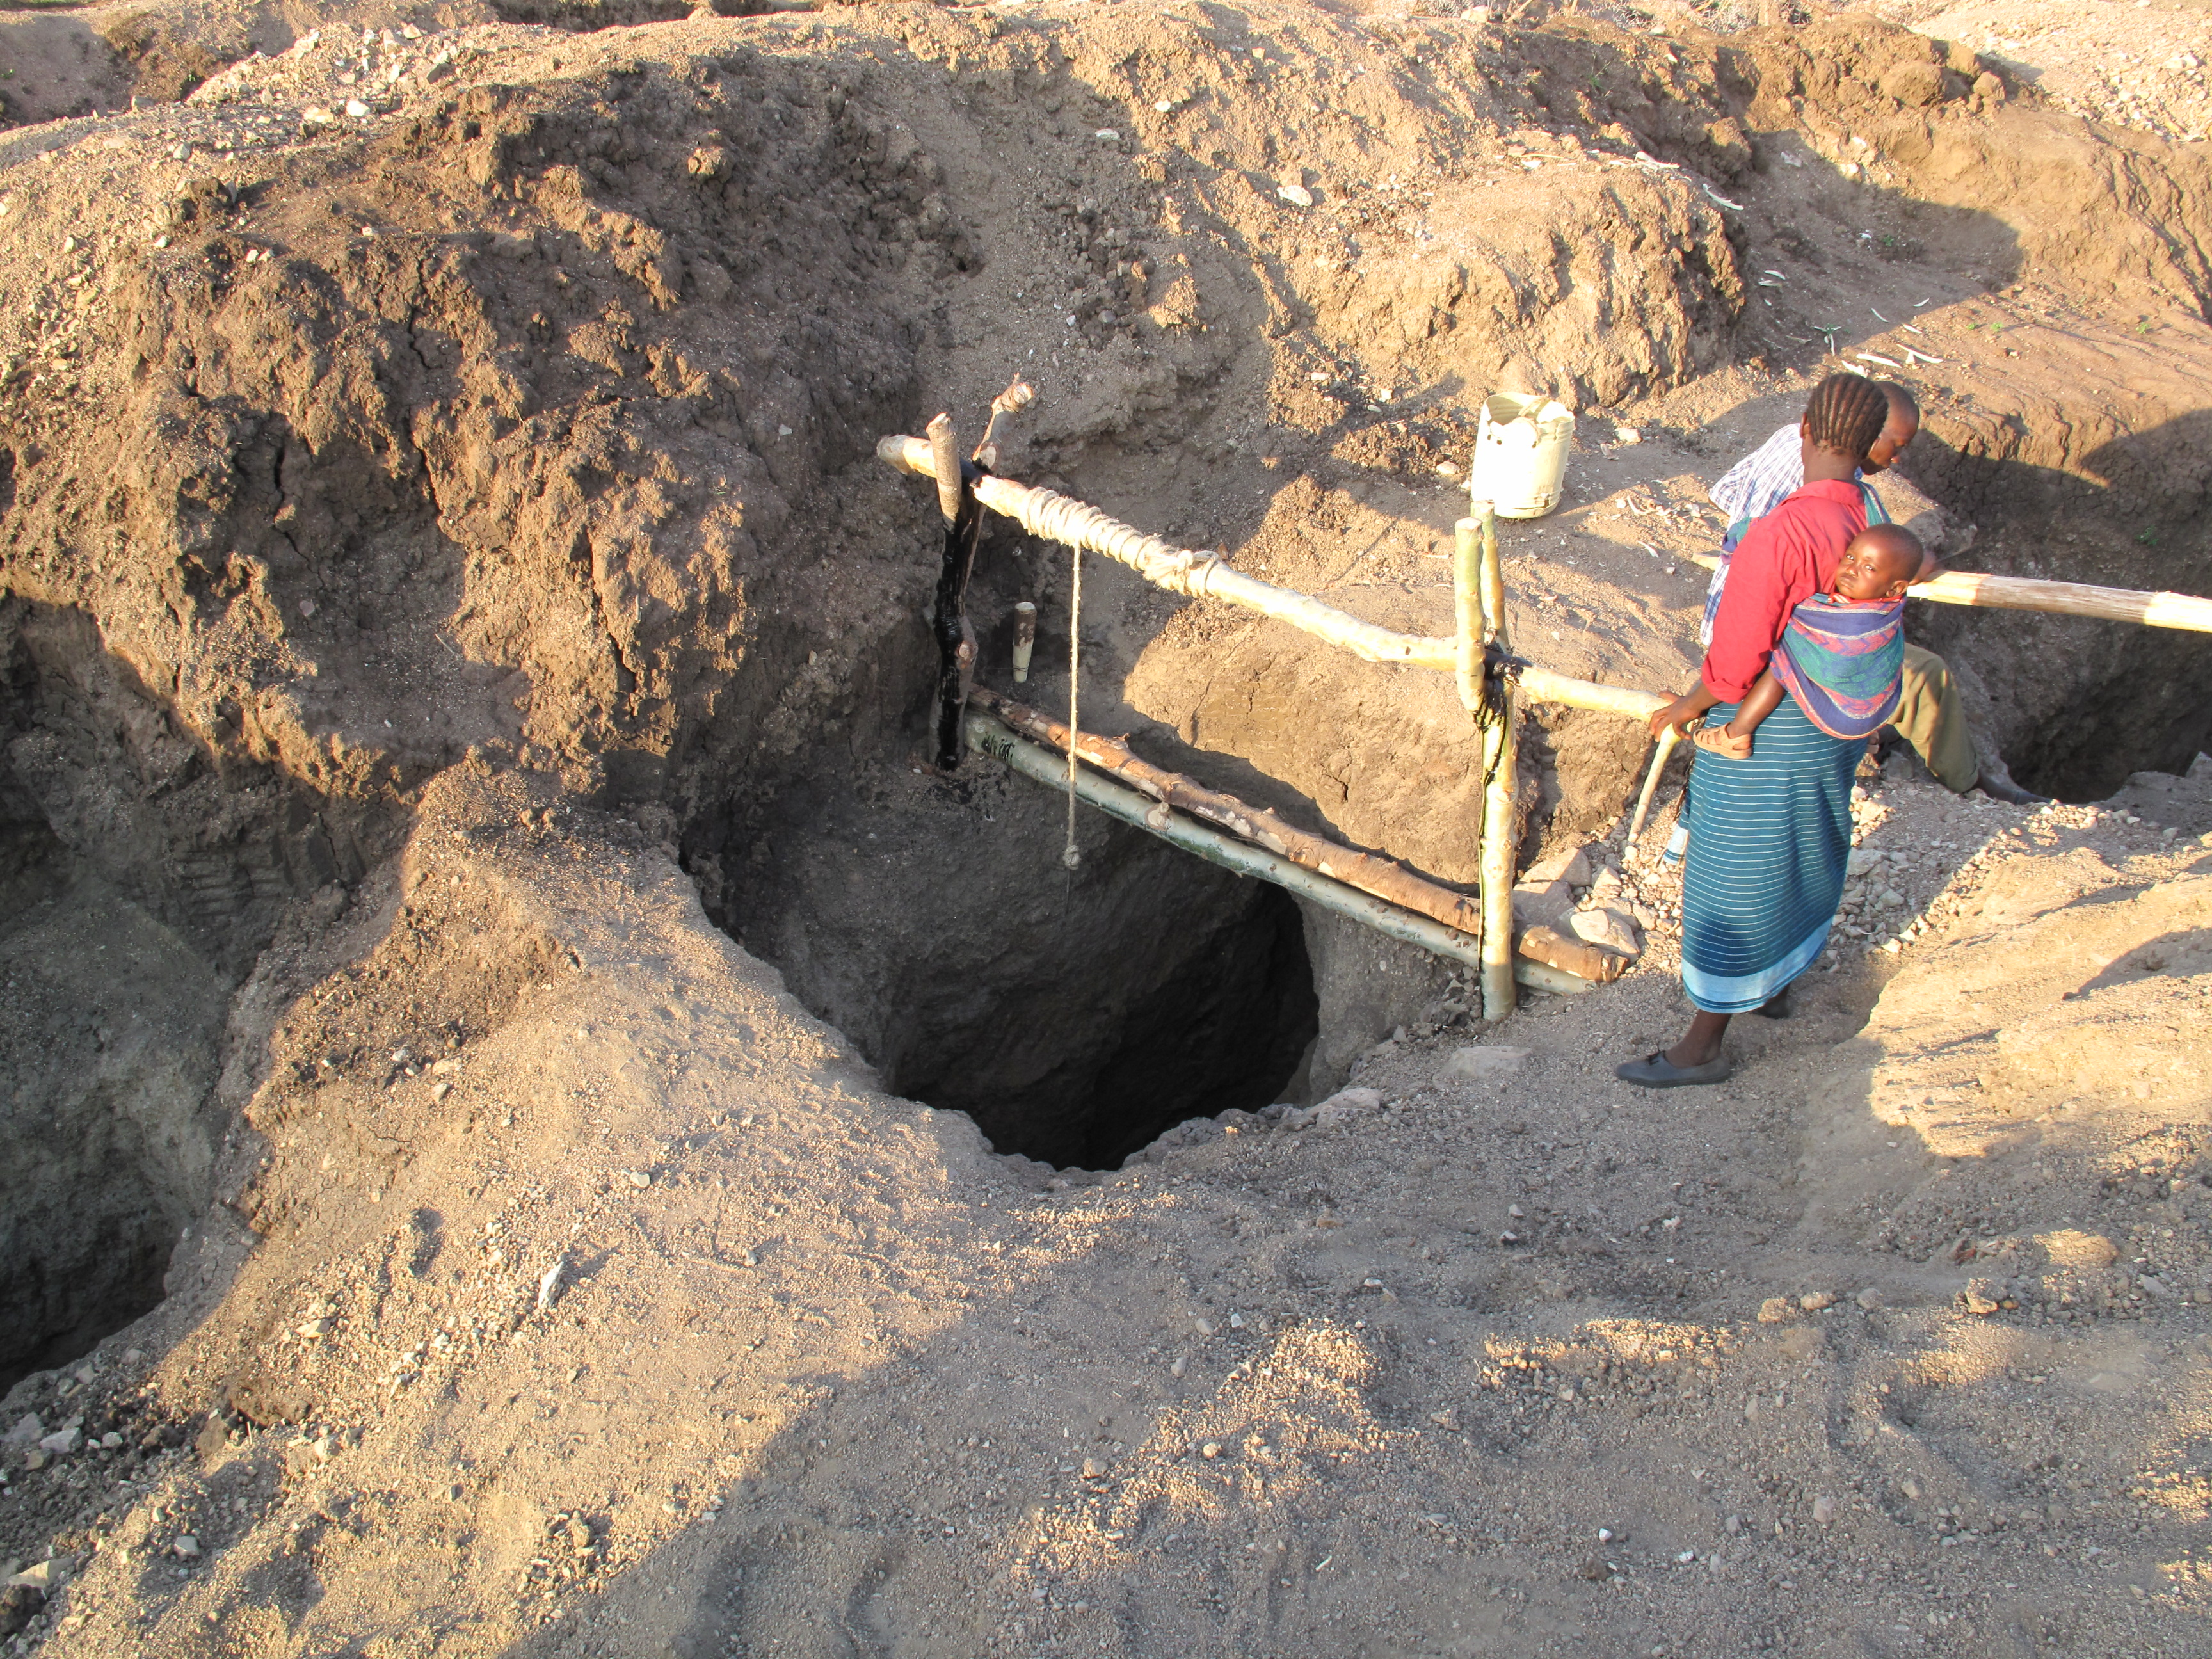 Small Mine Development : Small scale gold mining in bunda experience rural